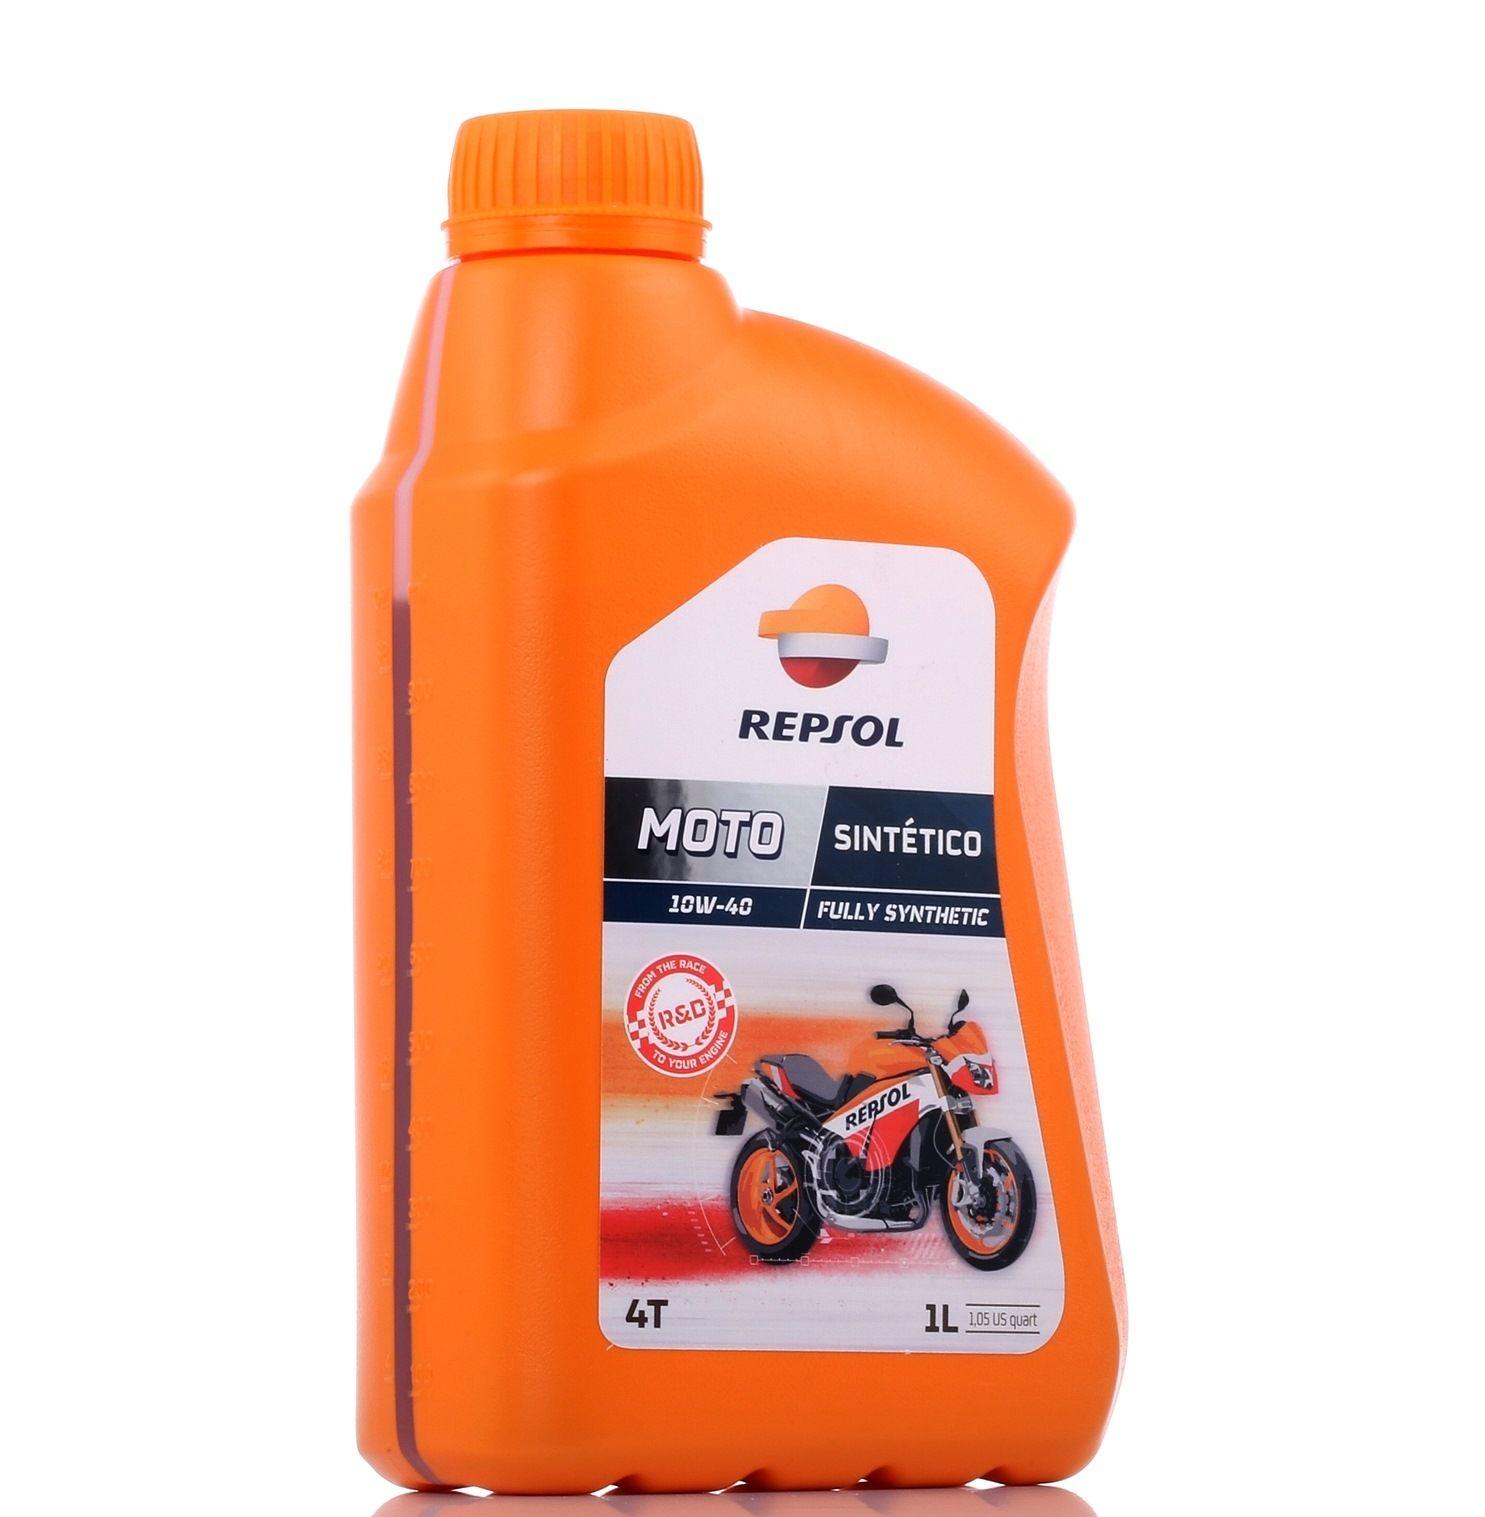 Moto REPSOL MOTO, Sintetico 4T 10W-40, 1l, Synthetiköl Motoröl RP163N51 günstig kaufen